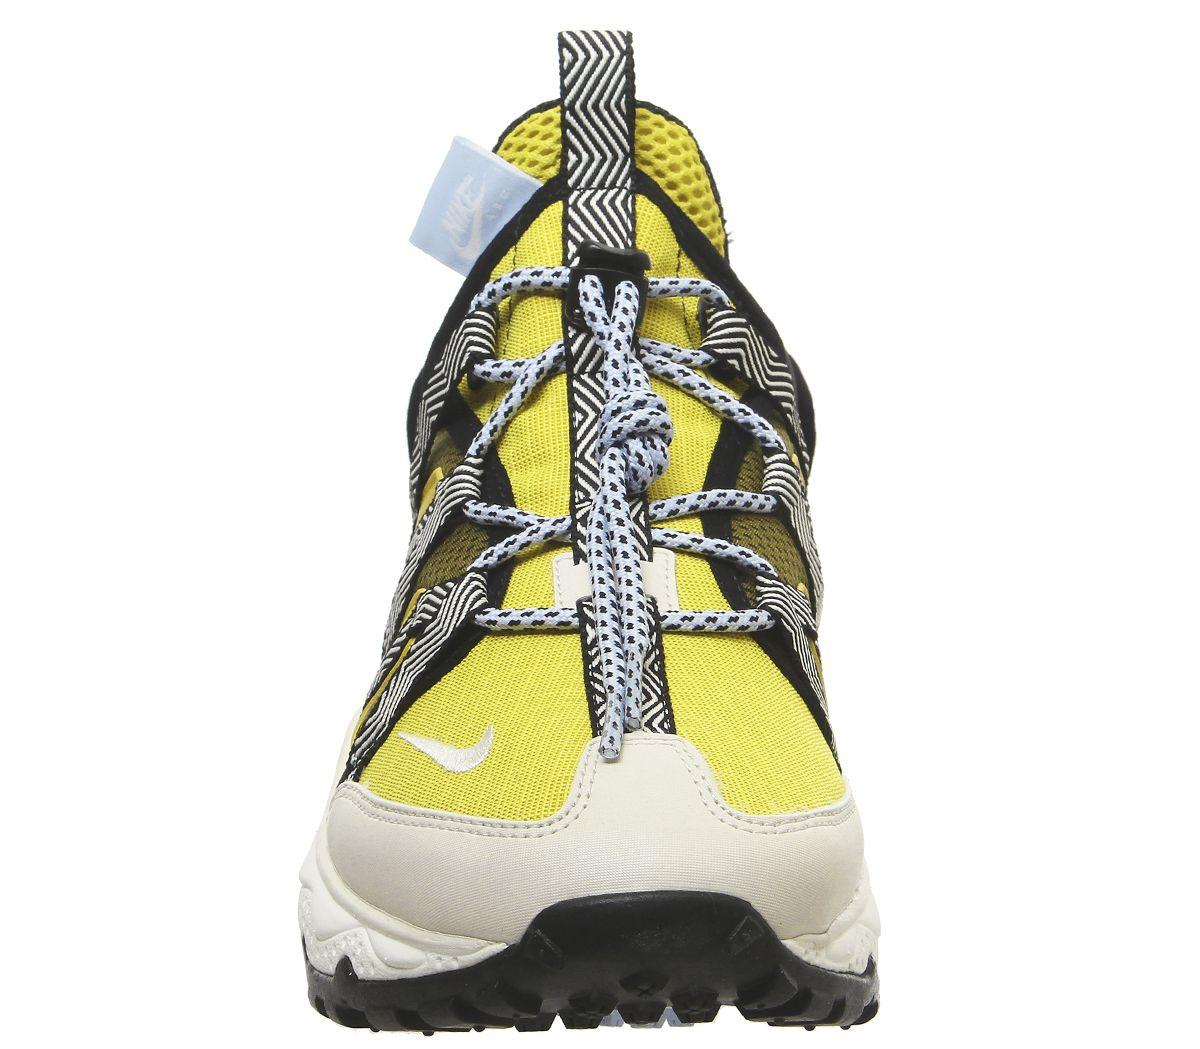 4c0f35e0a7 Nike - Multicolor Air Max 270 Bowfin In Dark Citron/light Cream for Men -.  View fullscreen